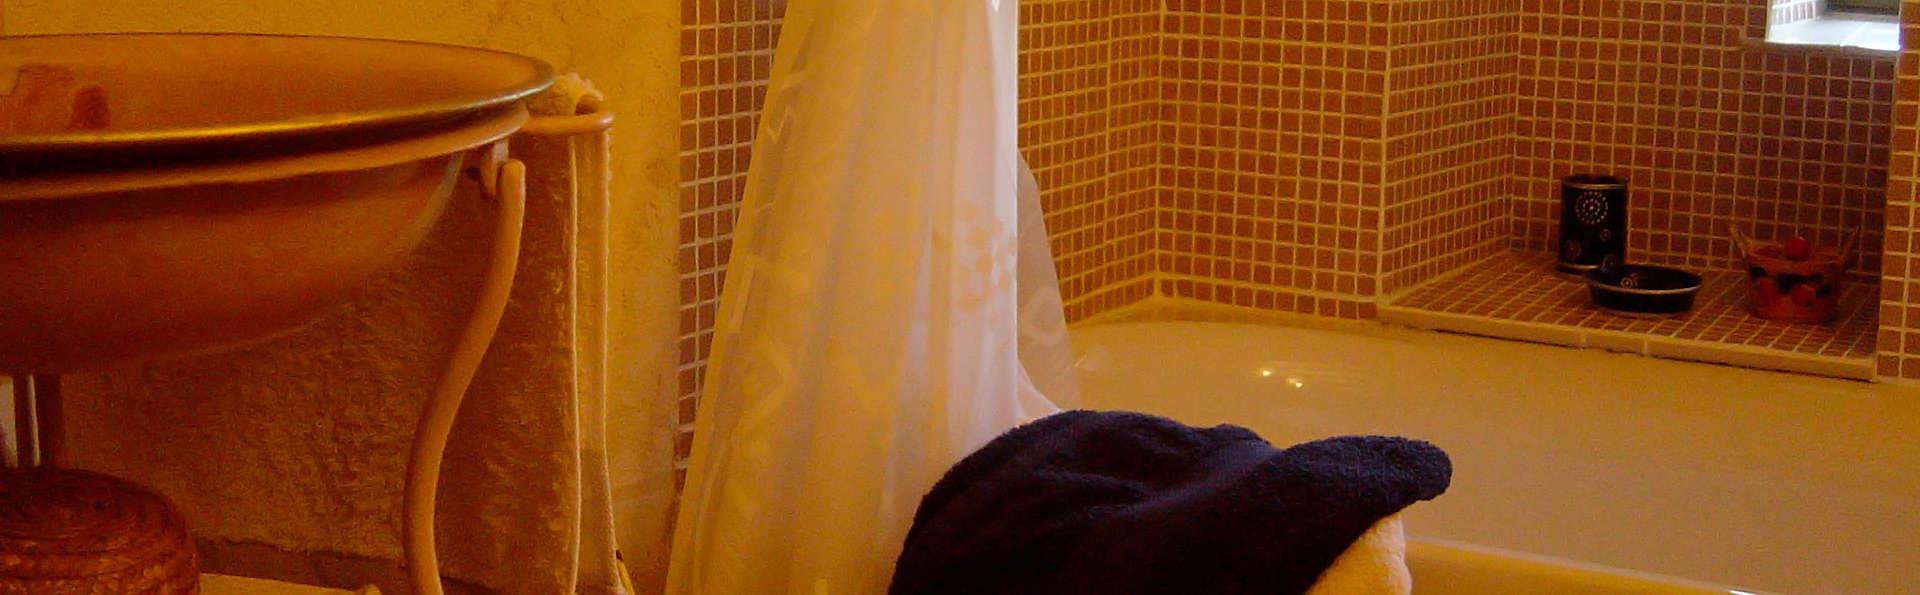 Manoir des Forges - Saint Brice - edit_bathroom1.jpg